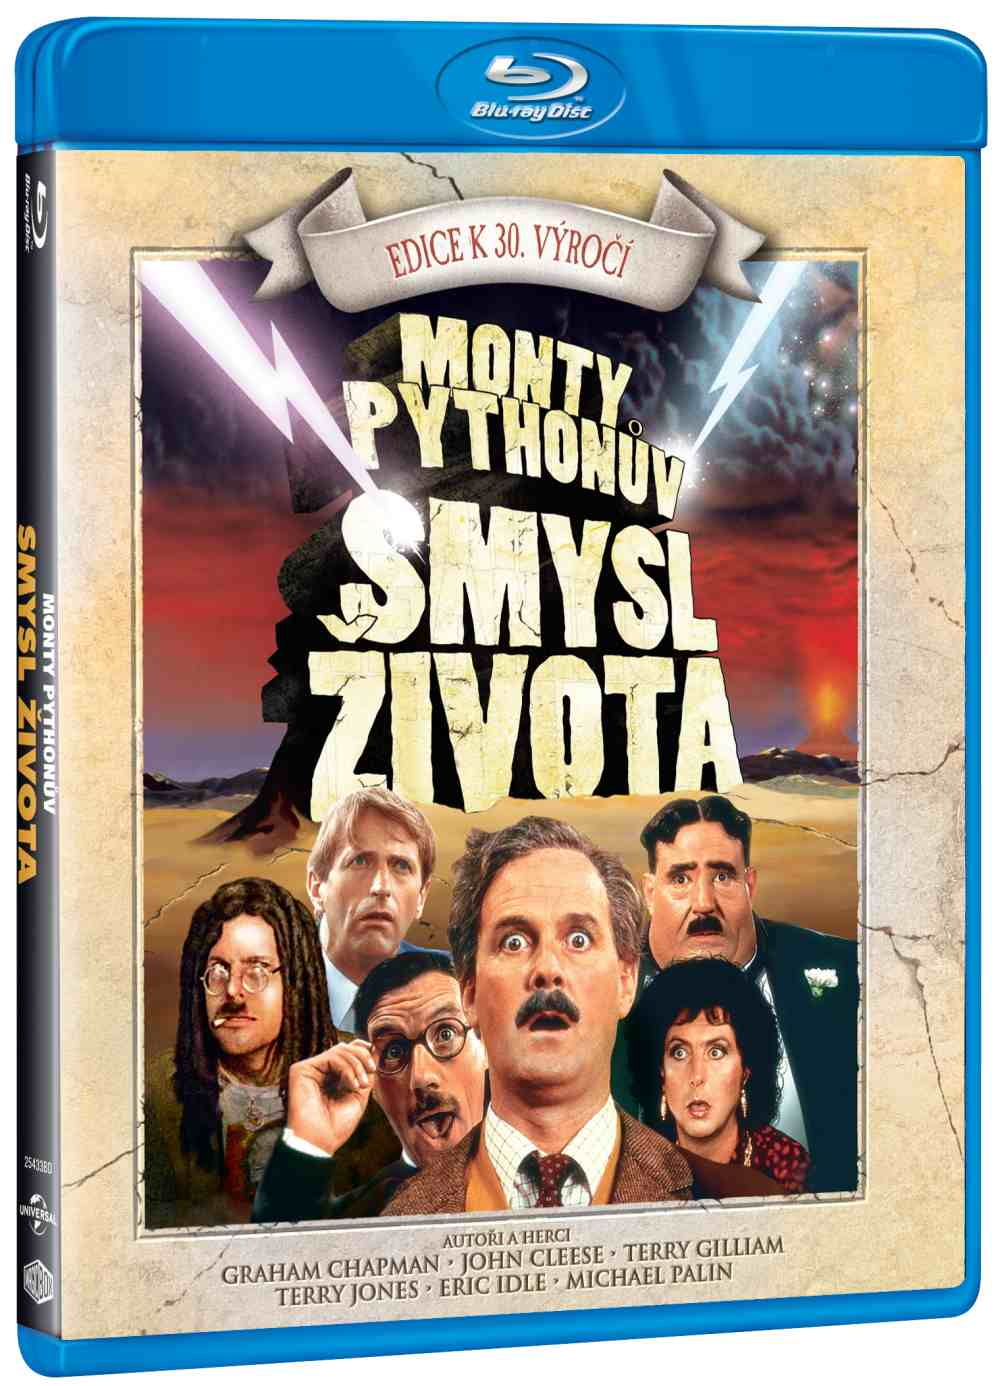 MONTY PYTHON: SMYSL ŽIVOTA - Blu-ray